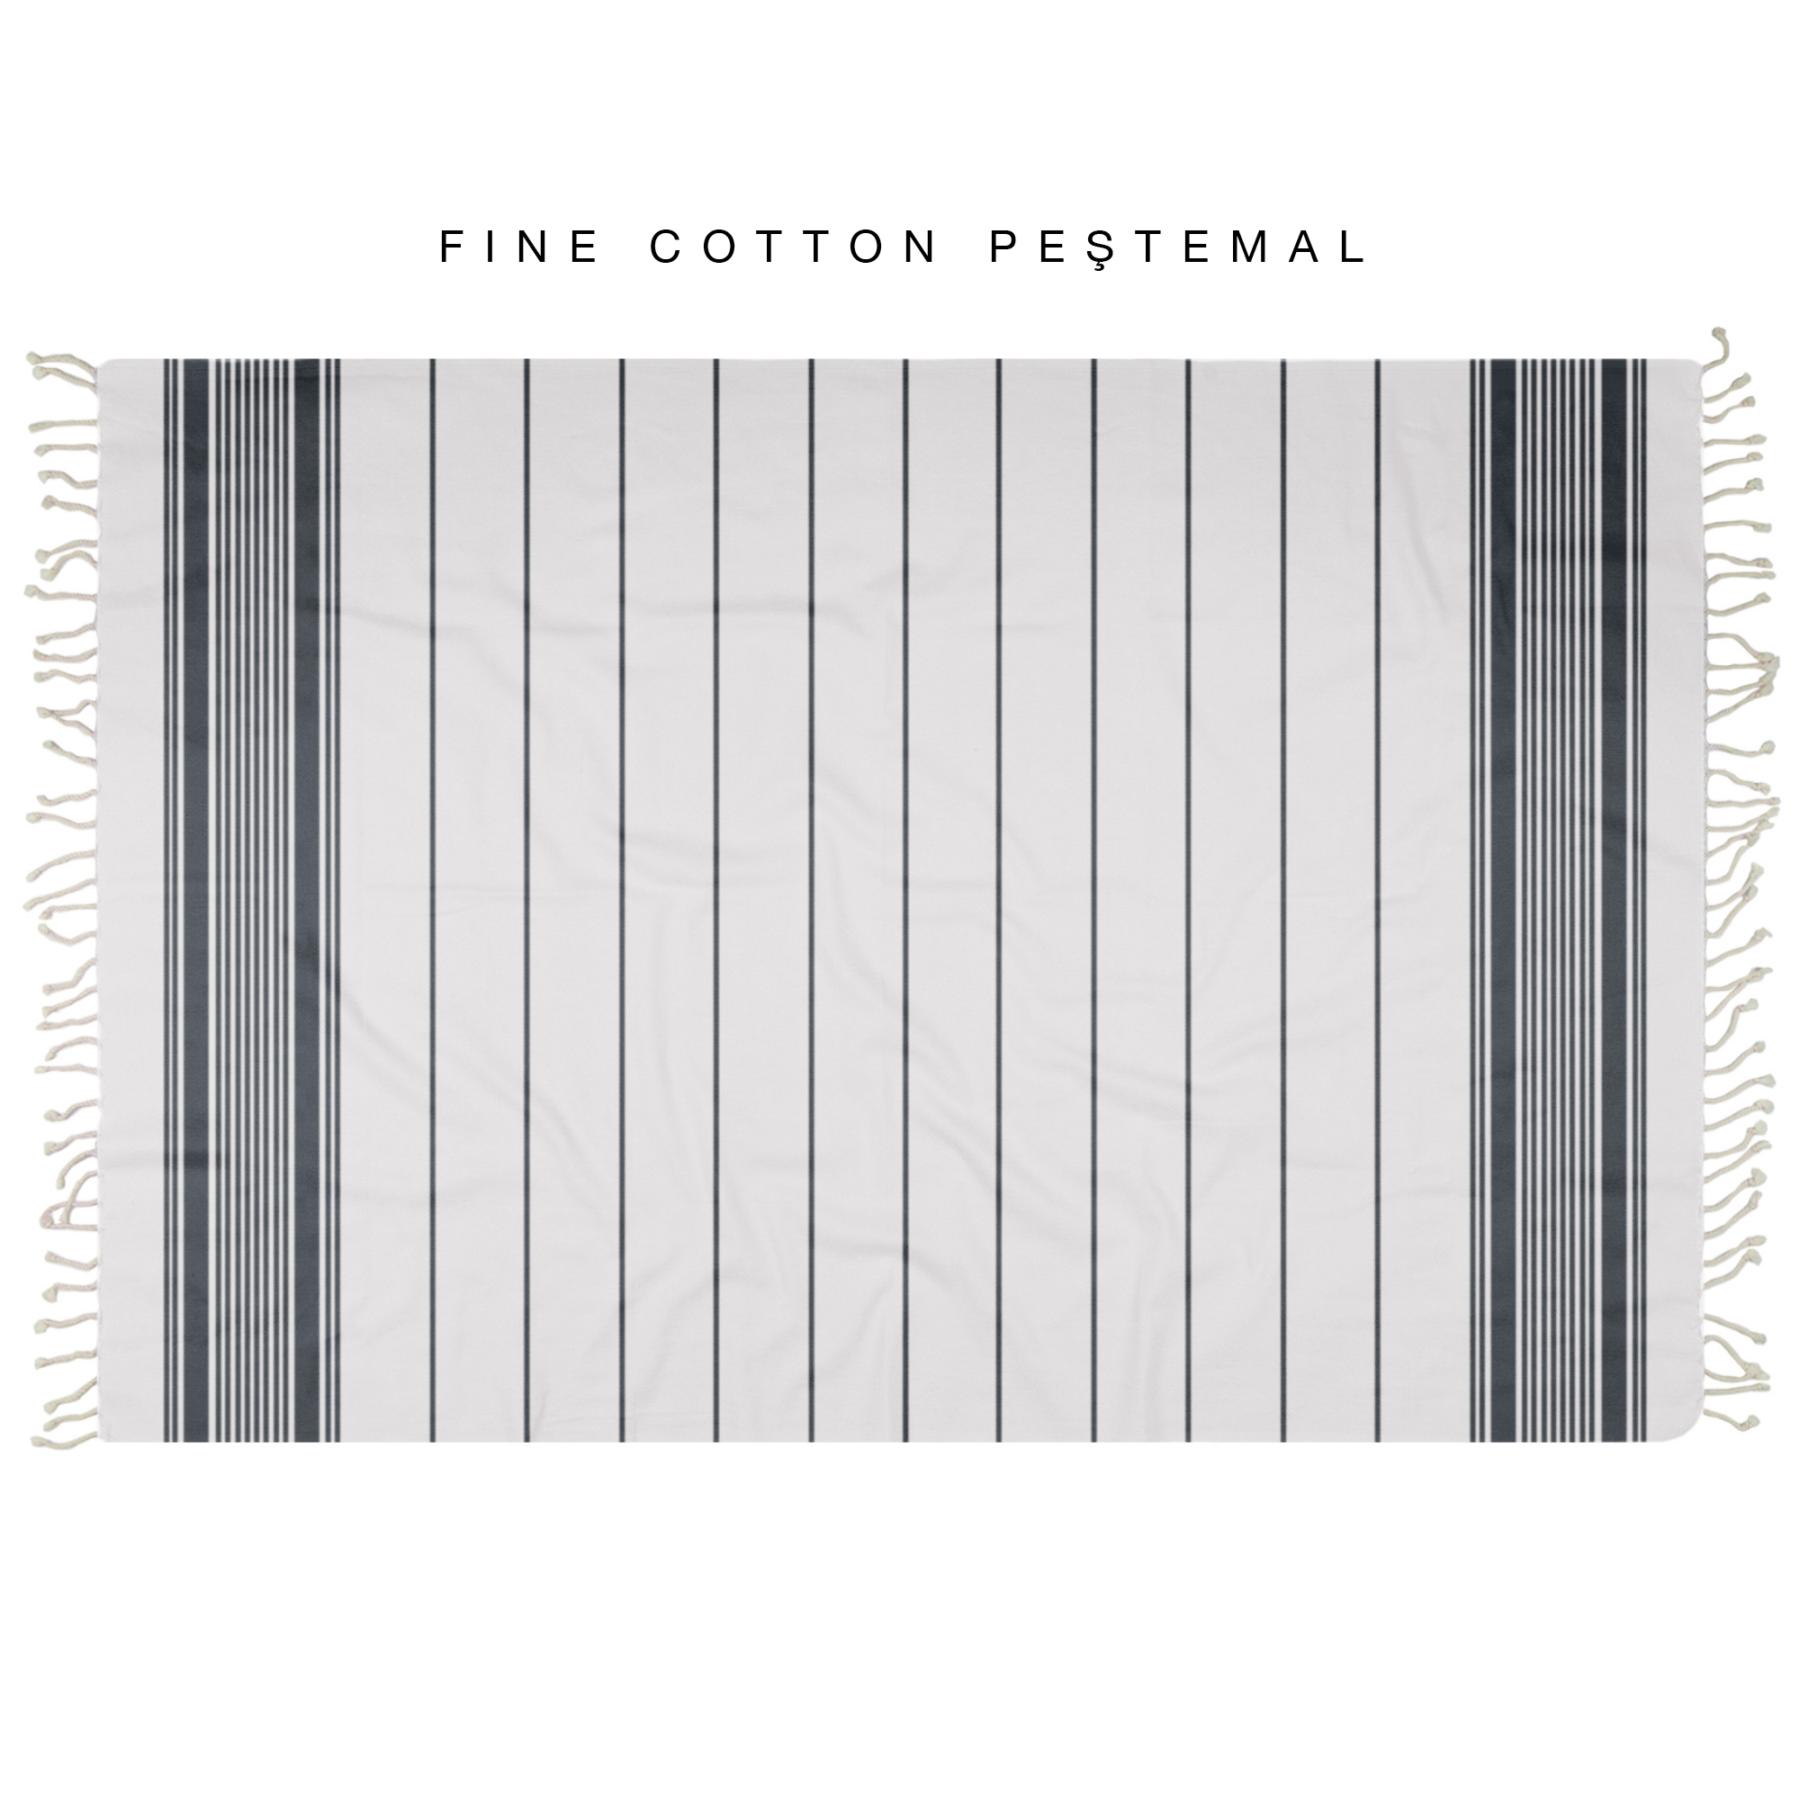 227465115-fine-cotton-pestemal-square-0001